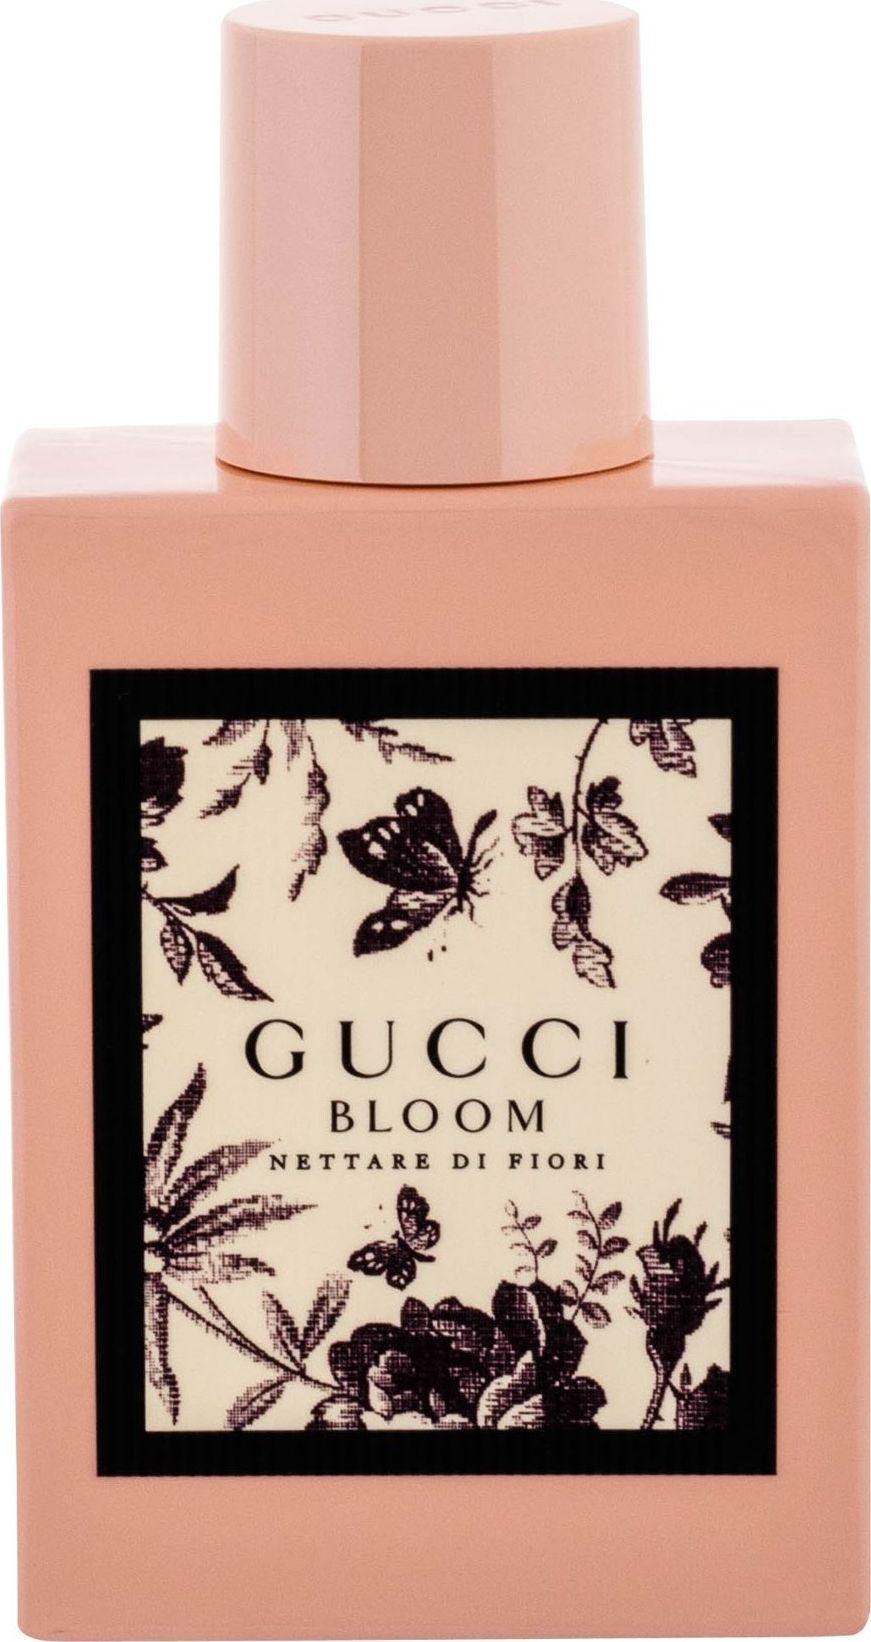 Gucci Bloom Nettare di Fiori EDP 50ml 6012119 Smaržas sievietēm